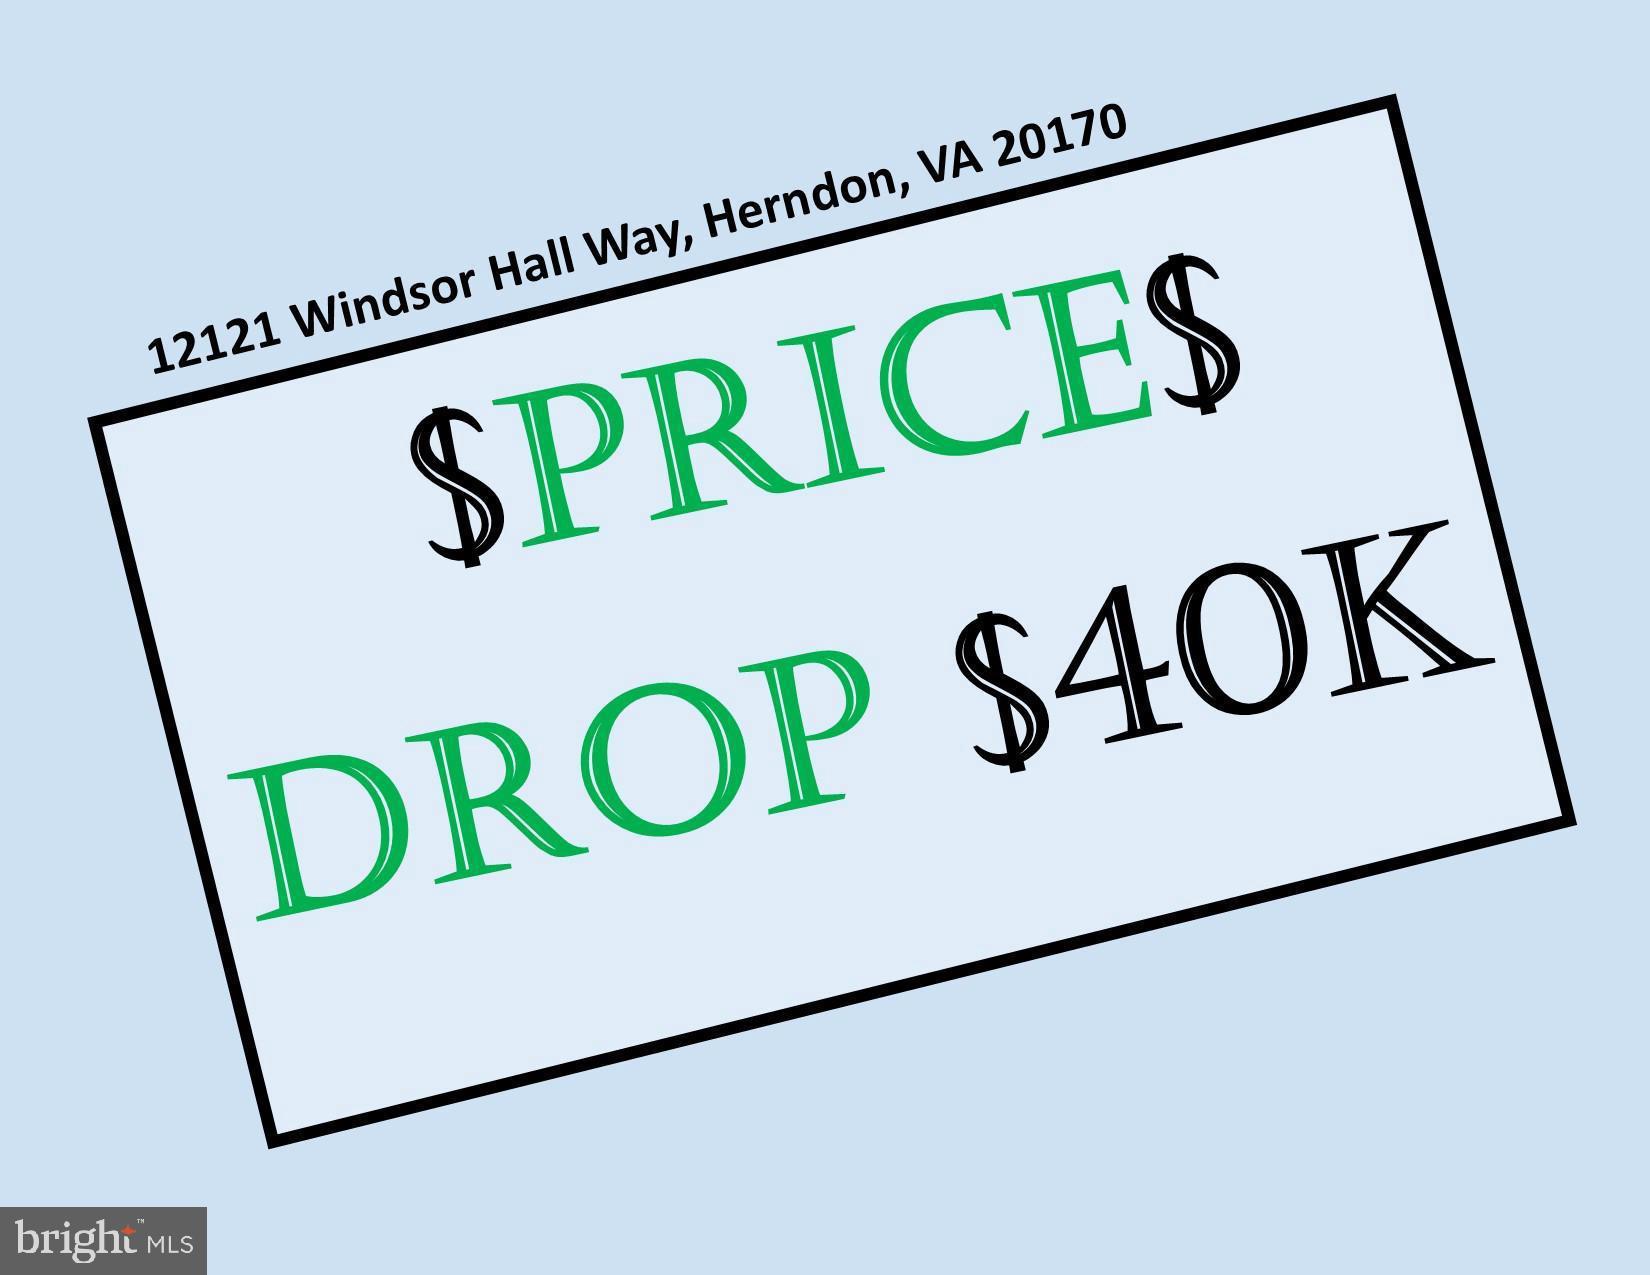 12121 WINDSOR HALL WAY, HERNDON, VA 20170